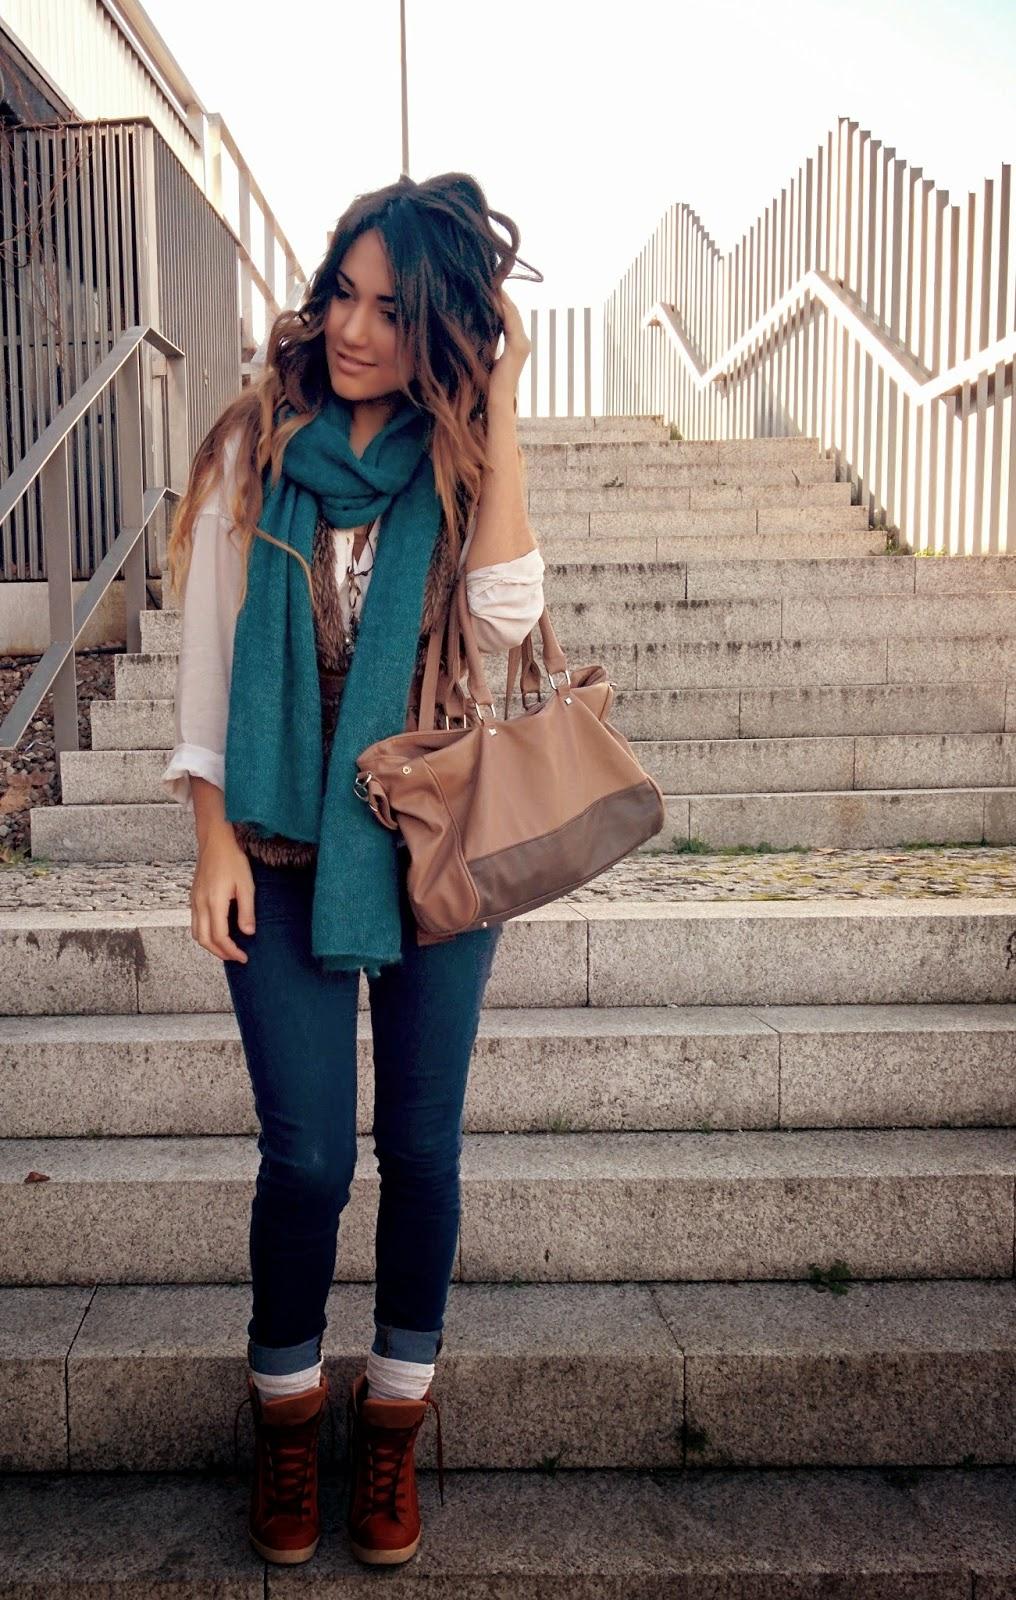 Zapatillas Outfit